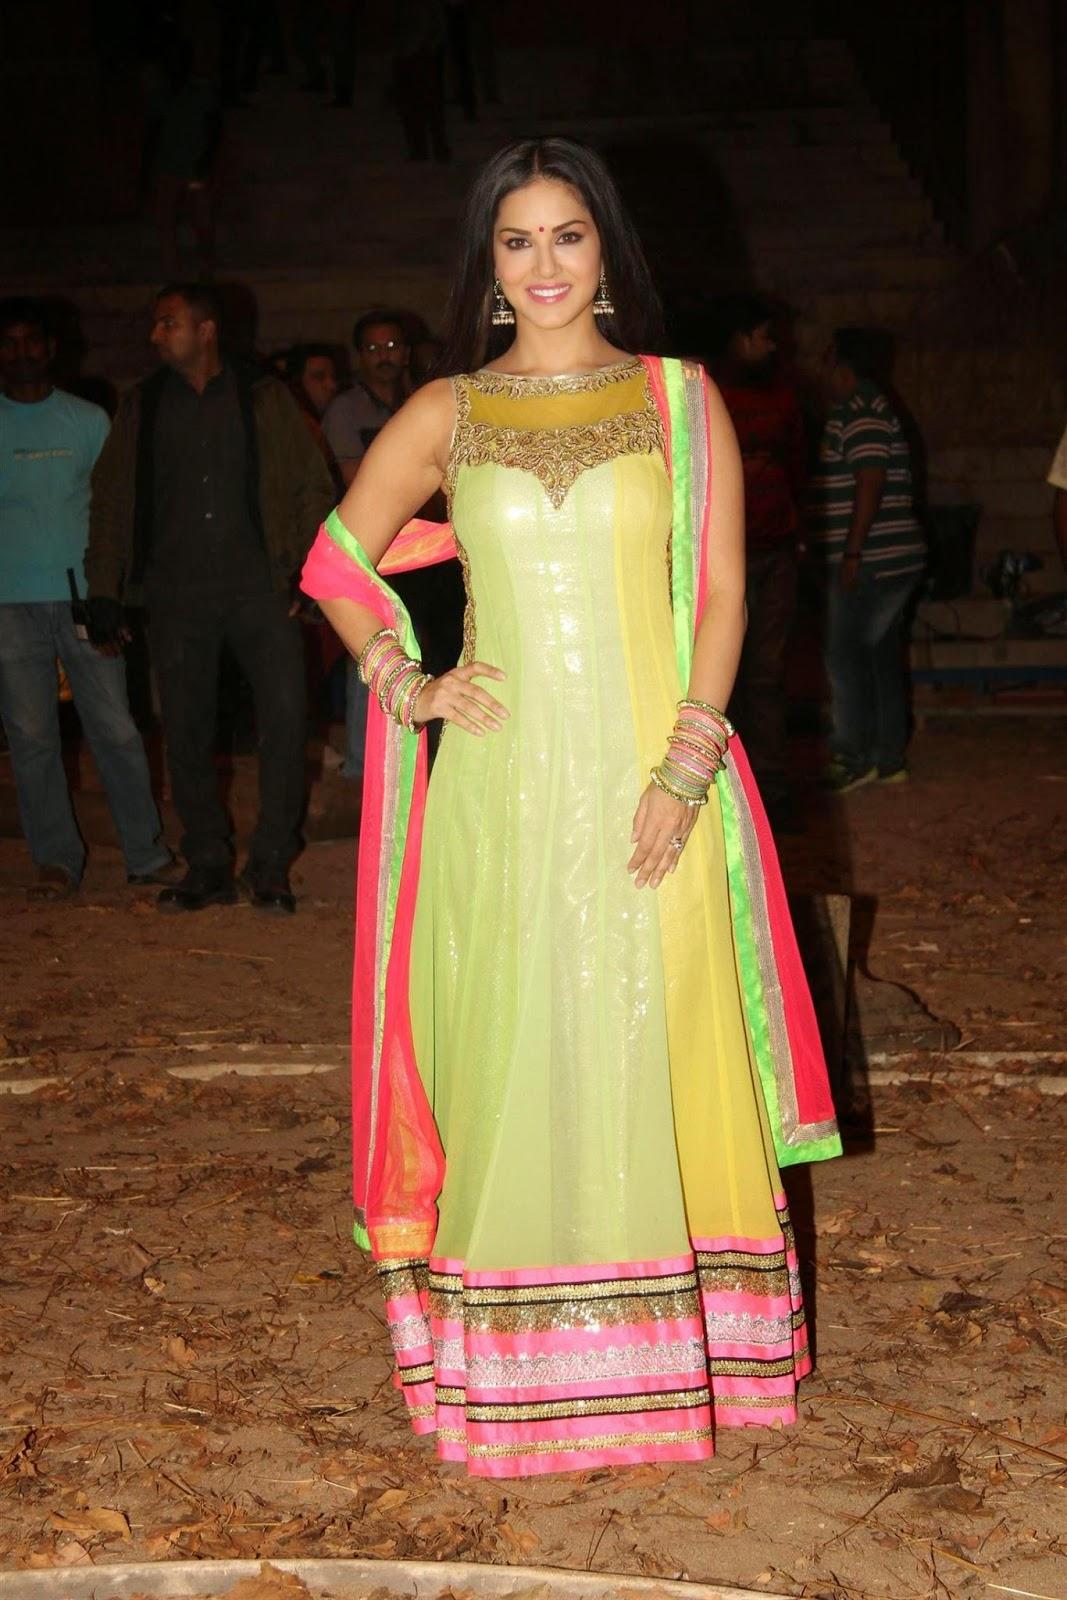 Sunny Leone Latest Photos At Ek Paheli Leela Movie Sets -2294